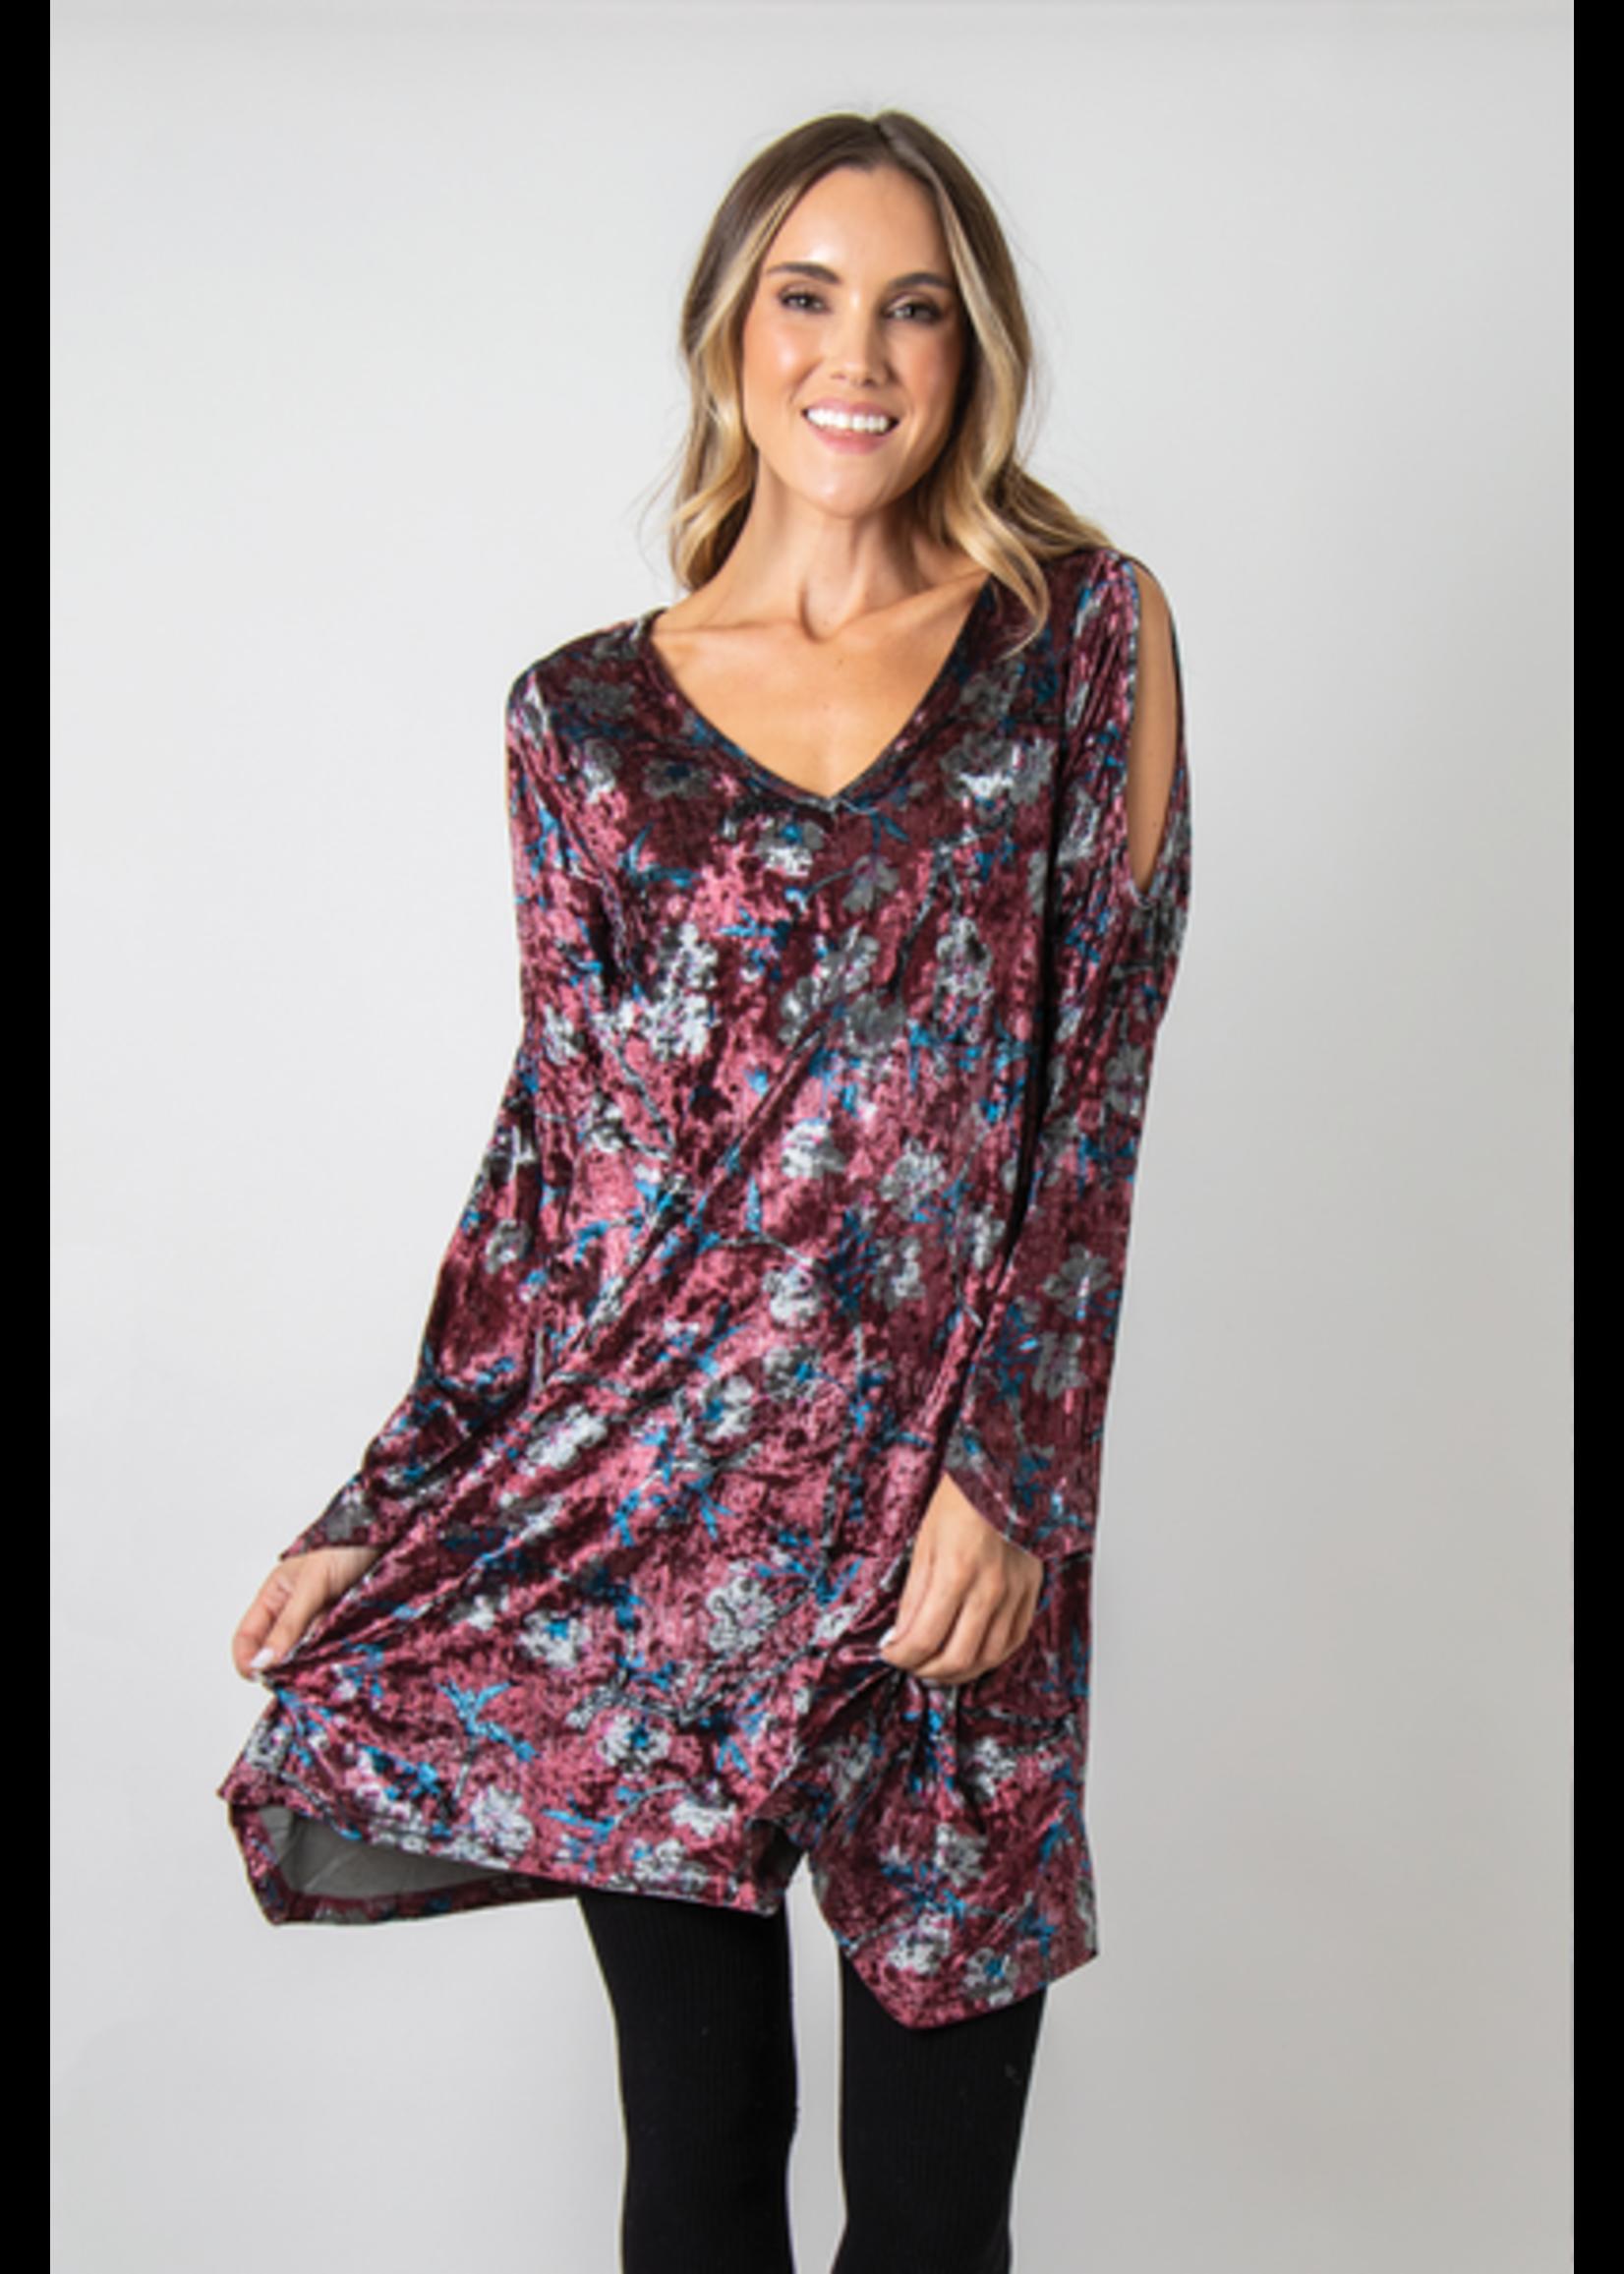 SIMPLY NOELLE AWESOME BLOSSOM ASSORTED VELVET DRESS L/XL